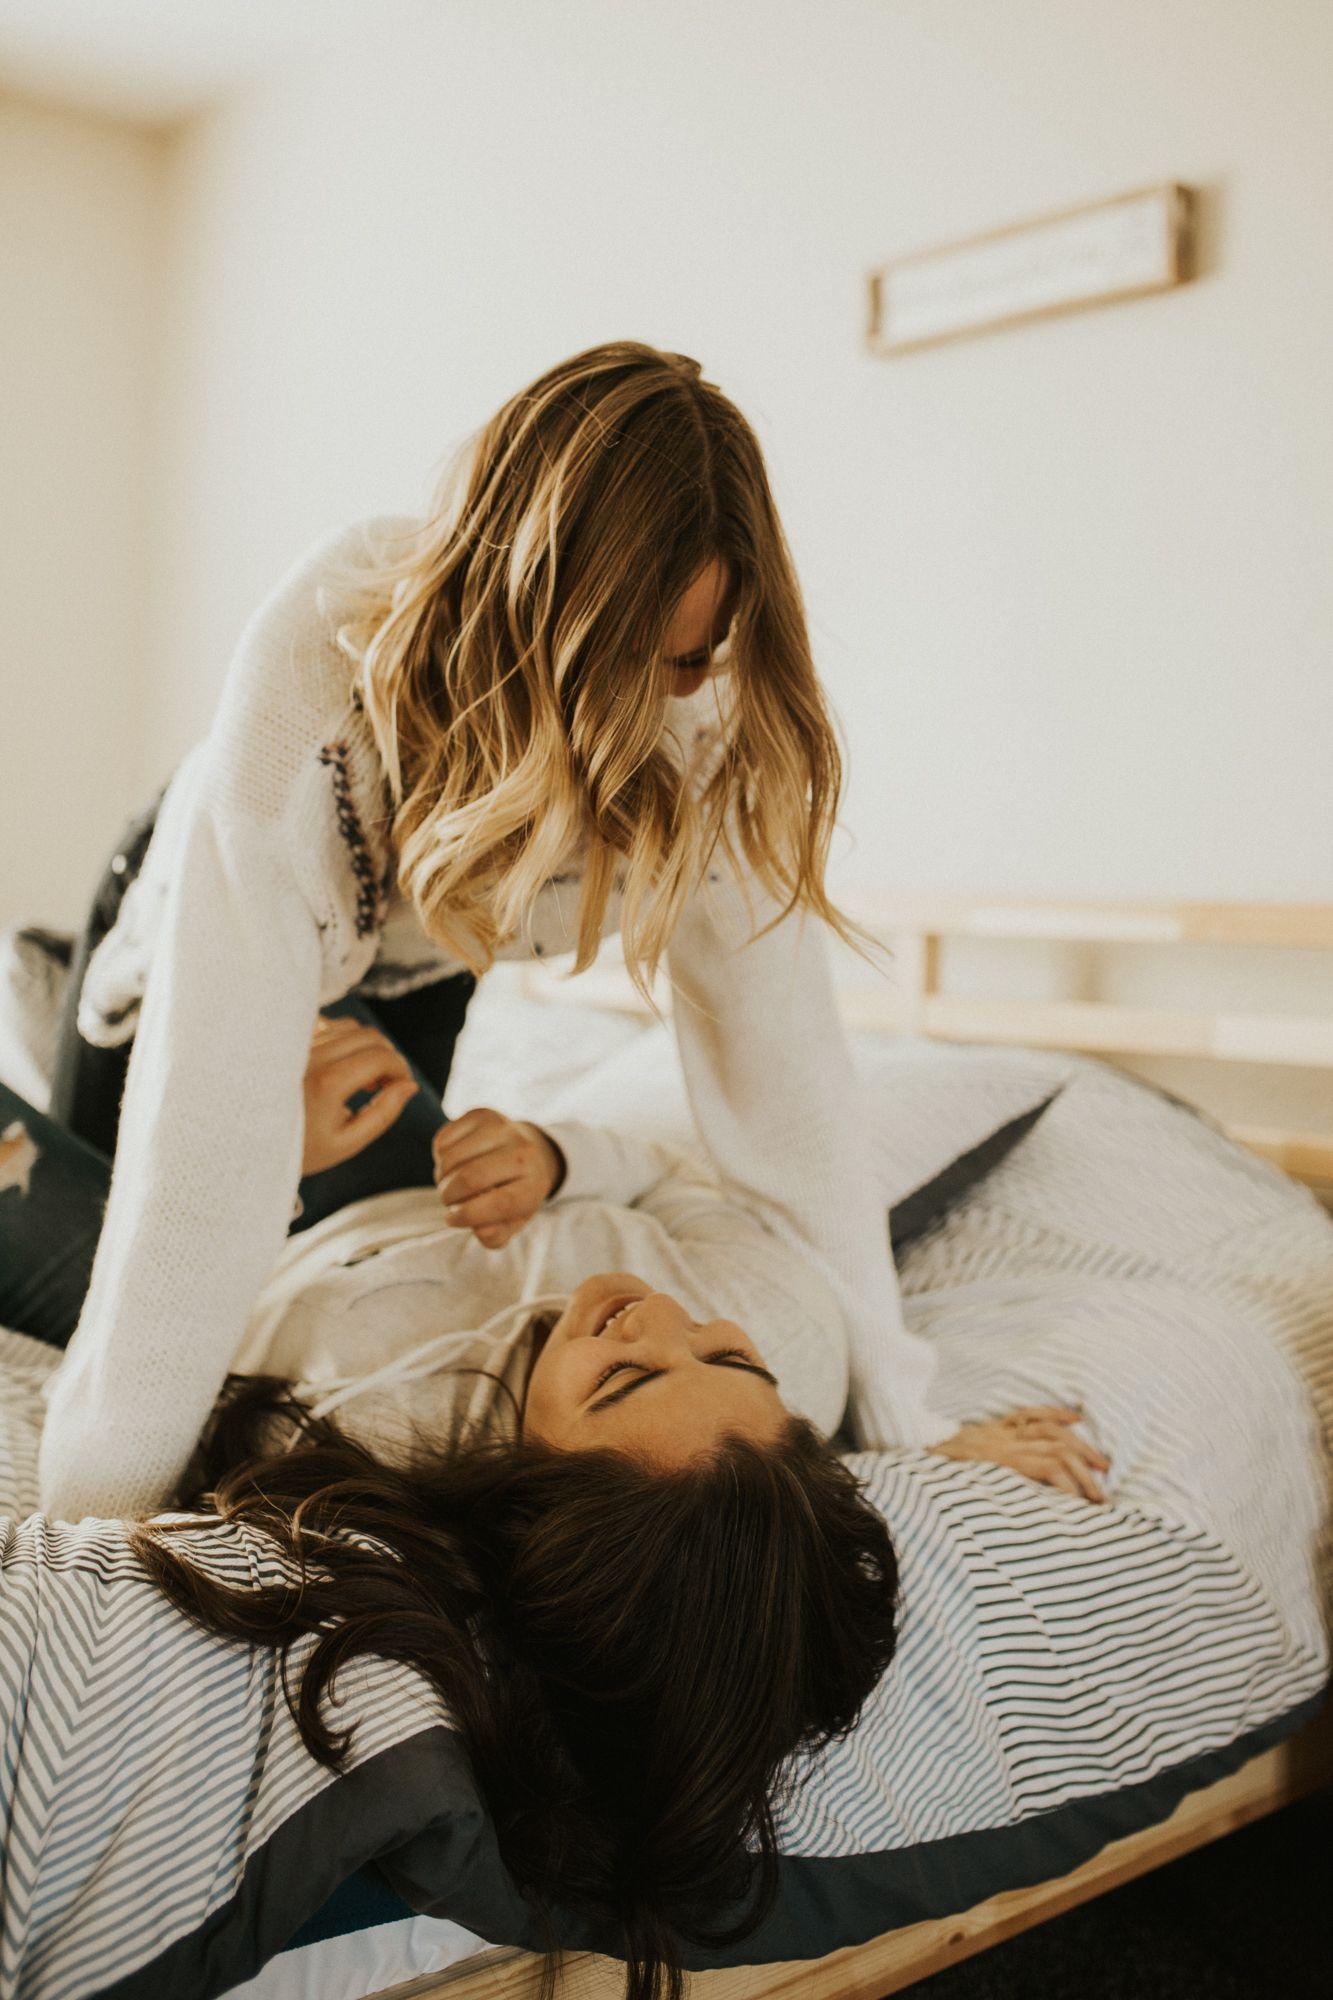 , Kalli + Amanda at home engagements by Calder Photography. At home engagement inspiration. Engagement inspiration. Indoor engagements. LGBTQ proposal. …, Travel Couple, Travel Couple